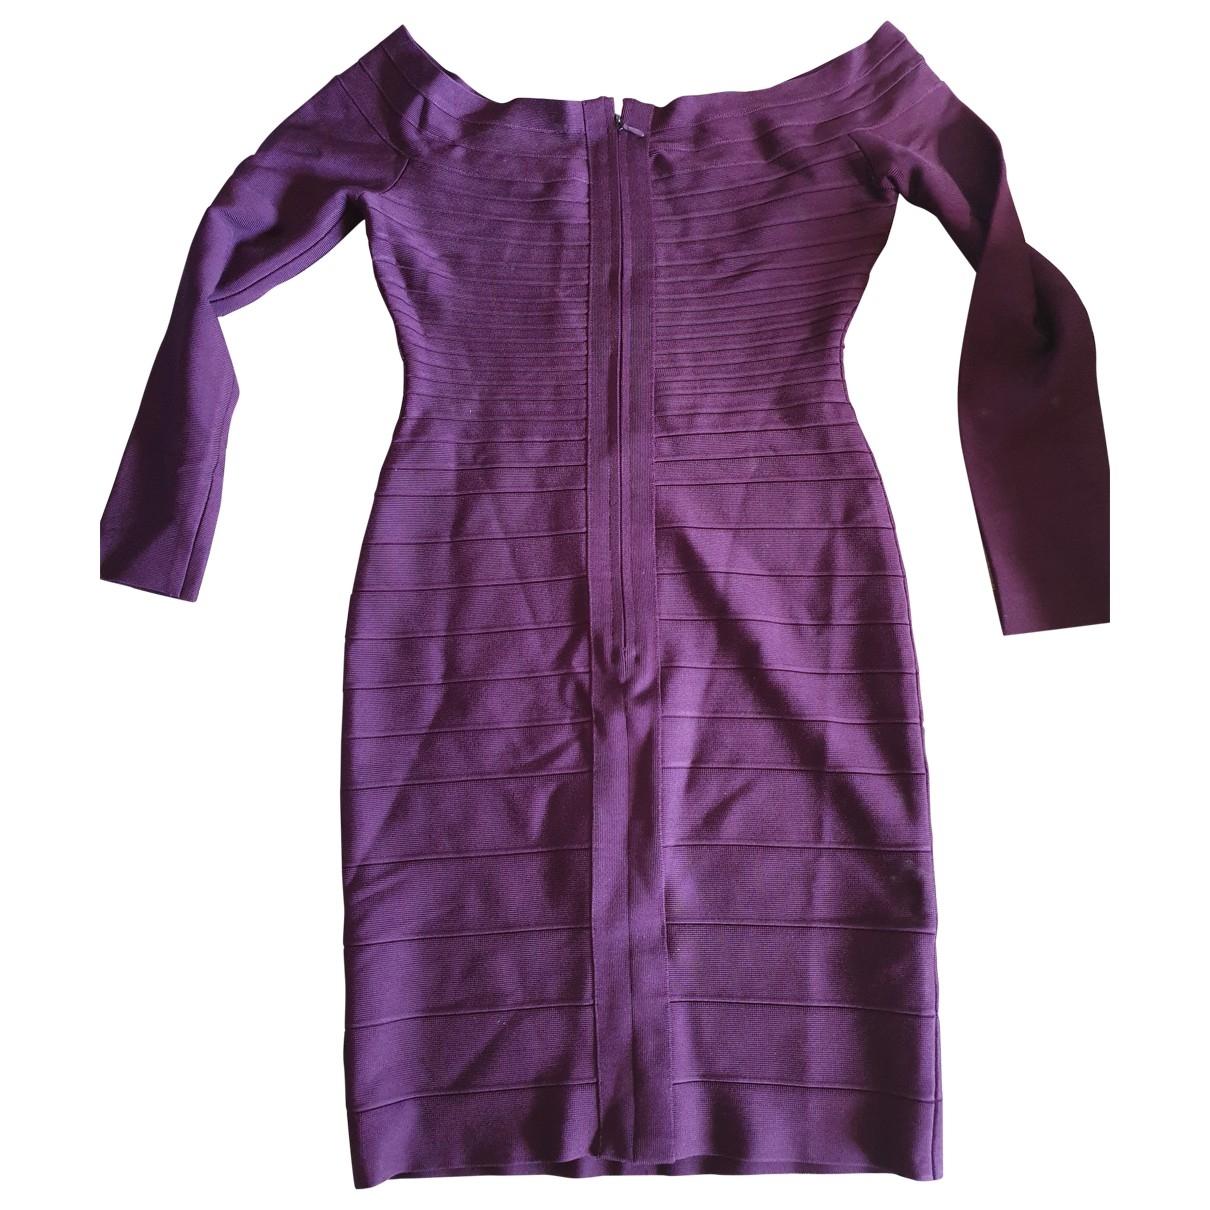 Herve Leger \N Kleid in  Lila Synthetik